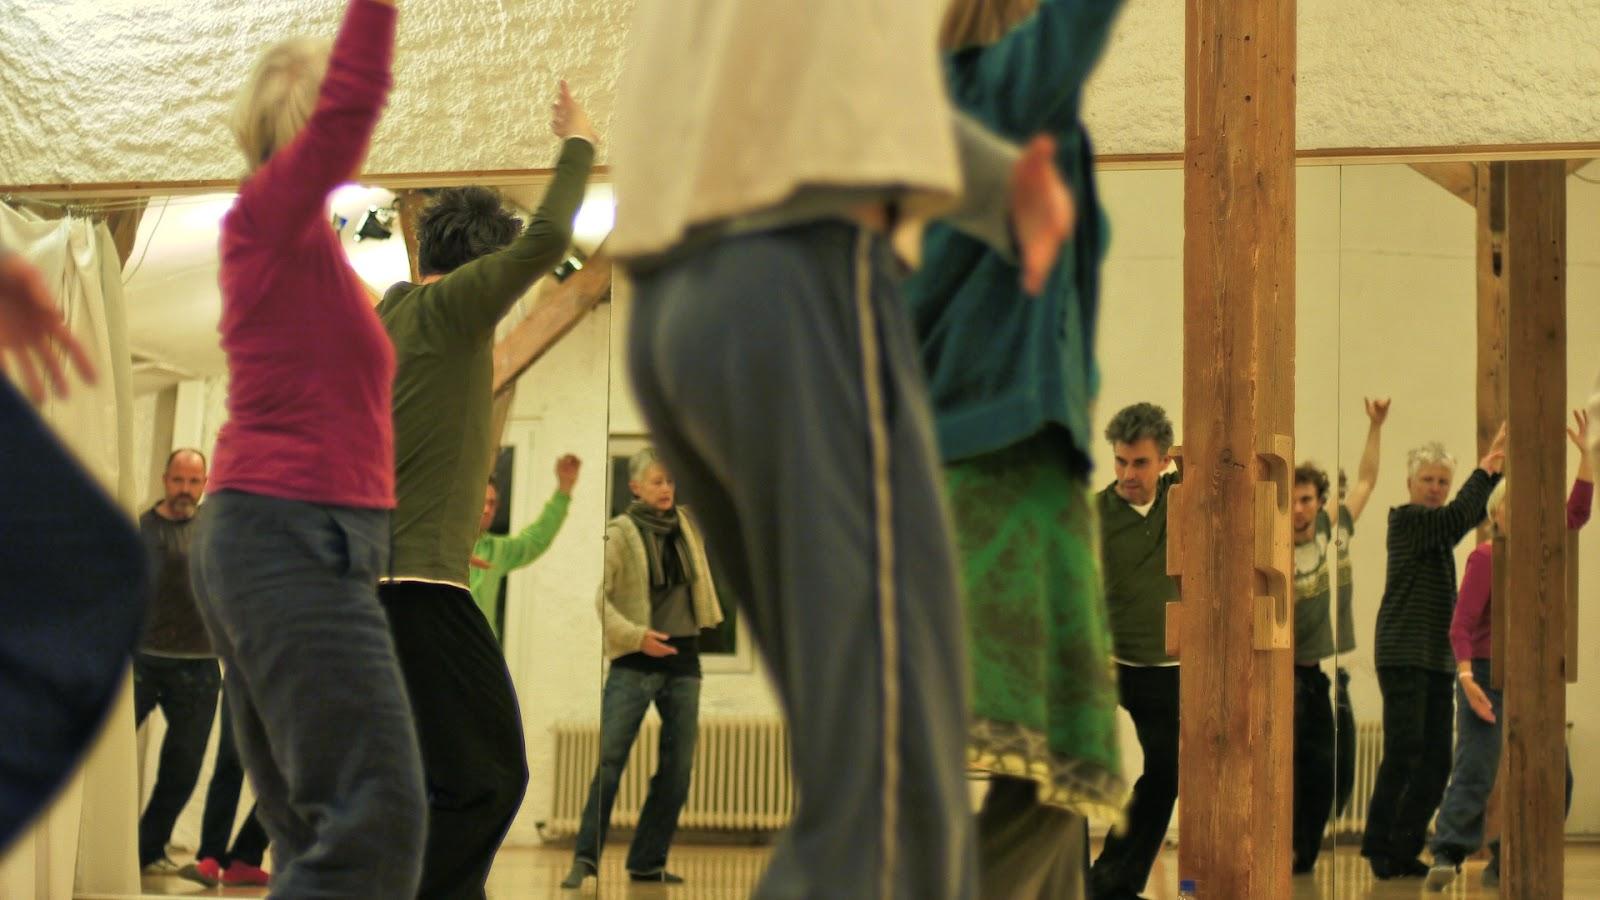 TaoMovement: Freie Tanz Studien: Lecture zu TaoMovement